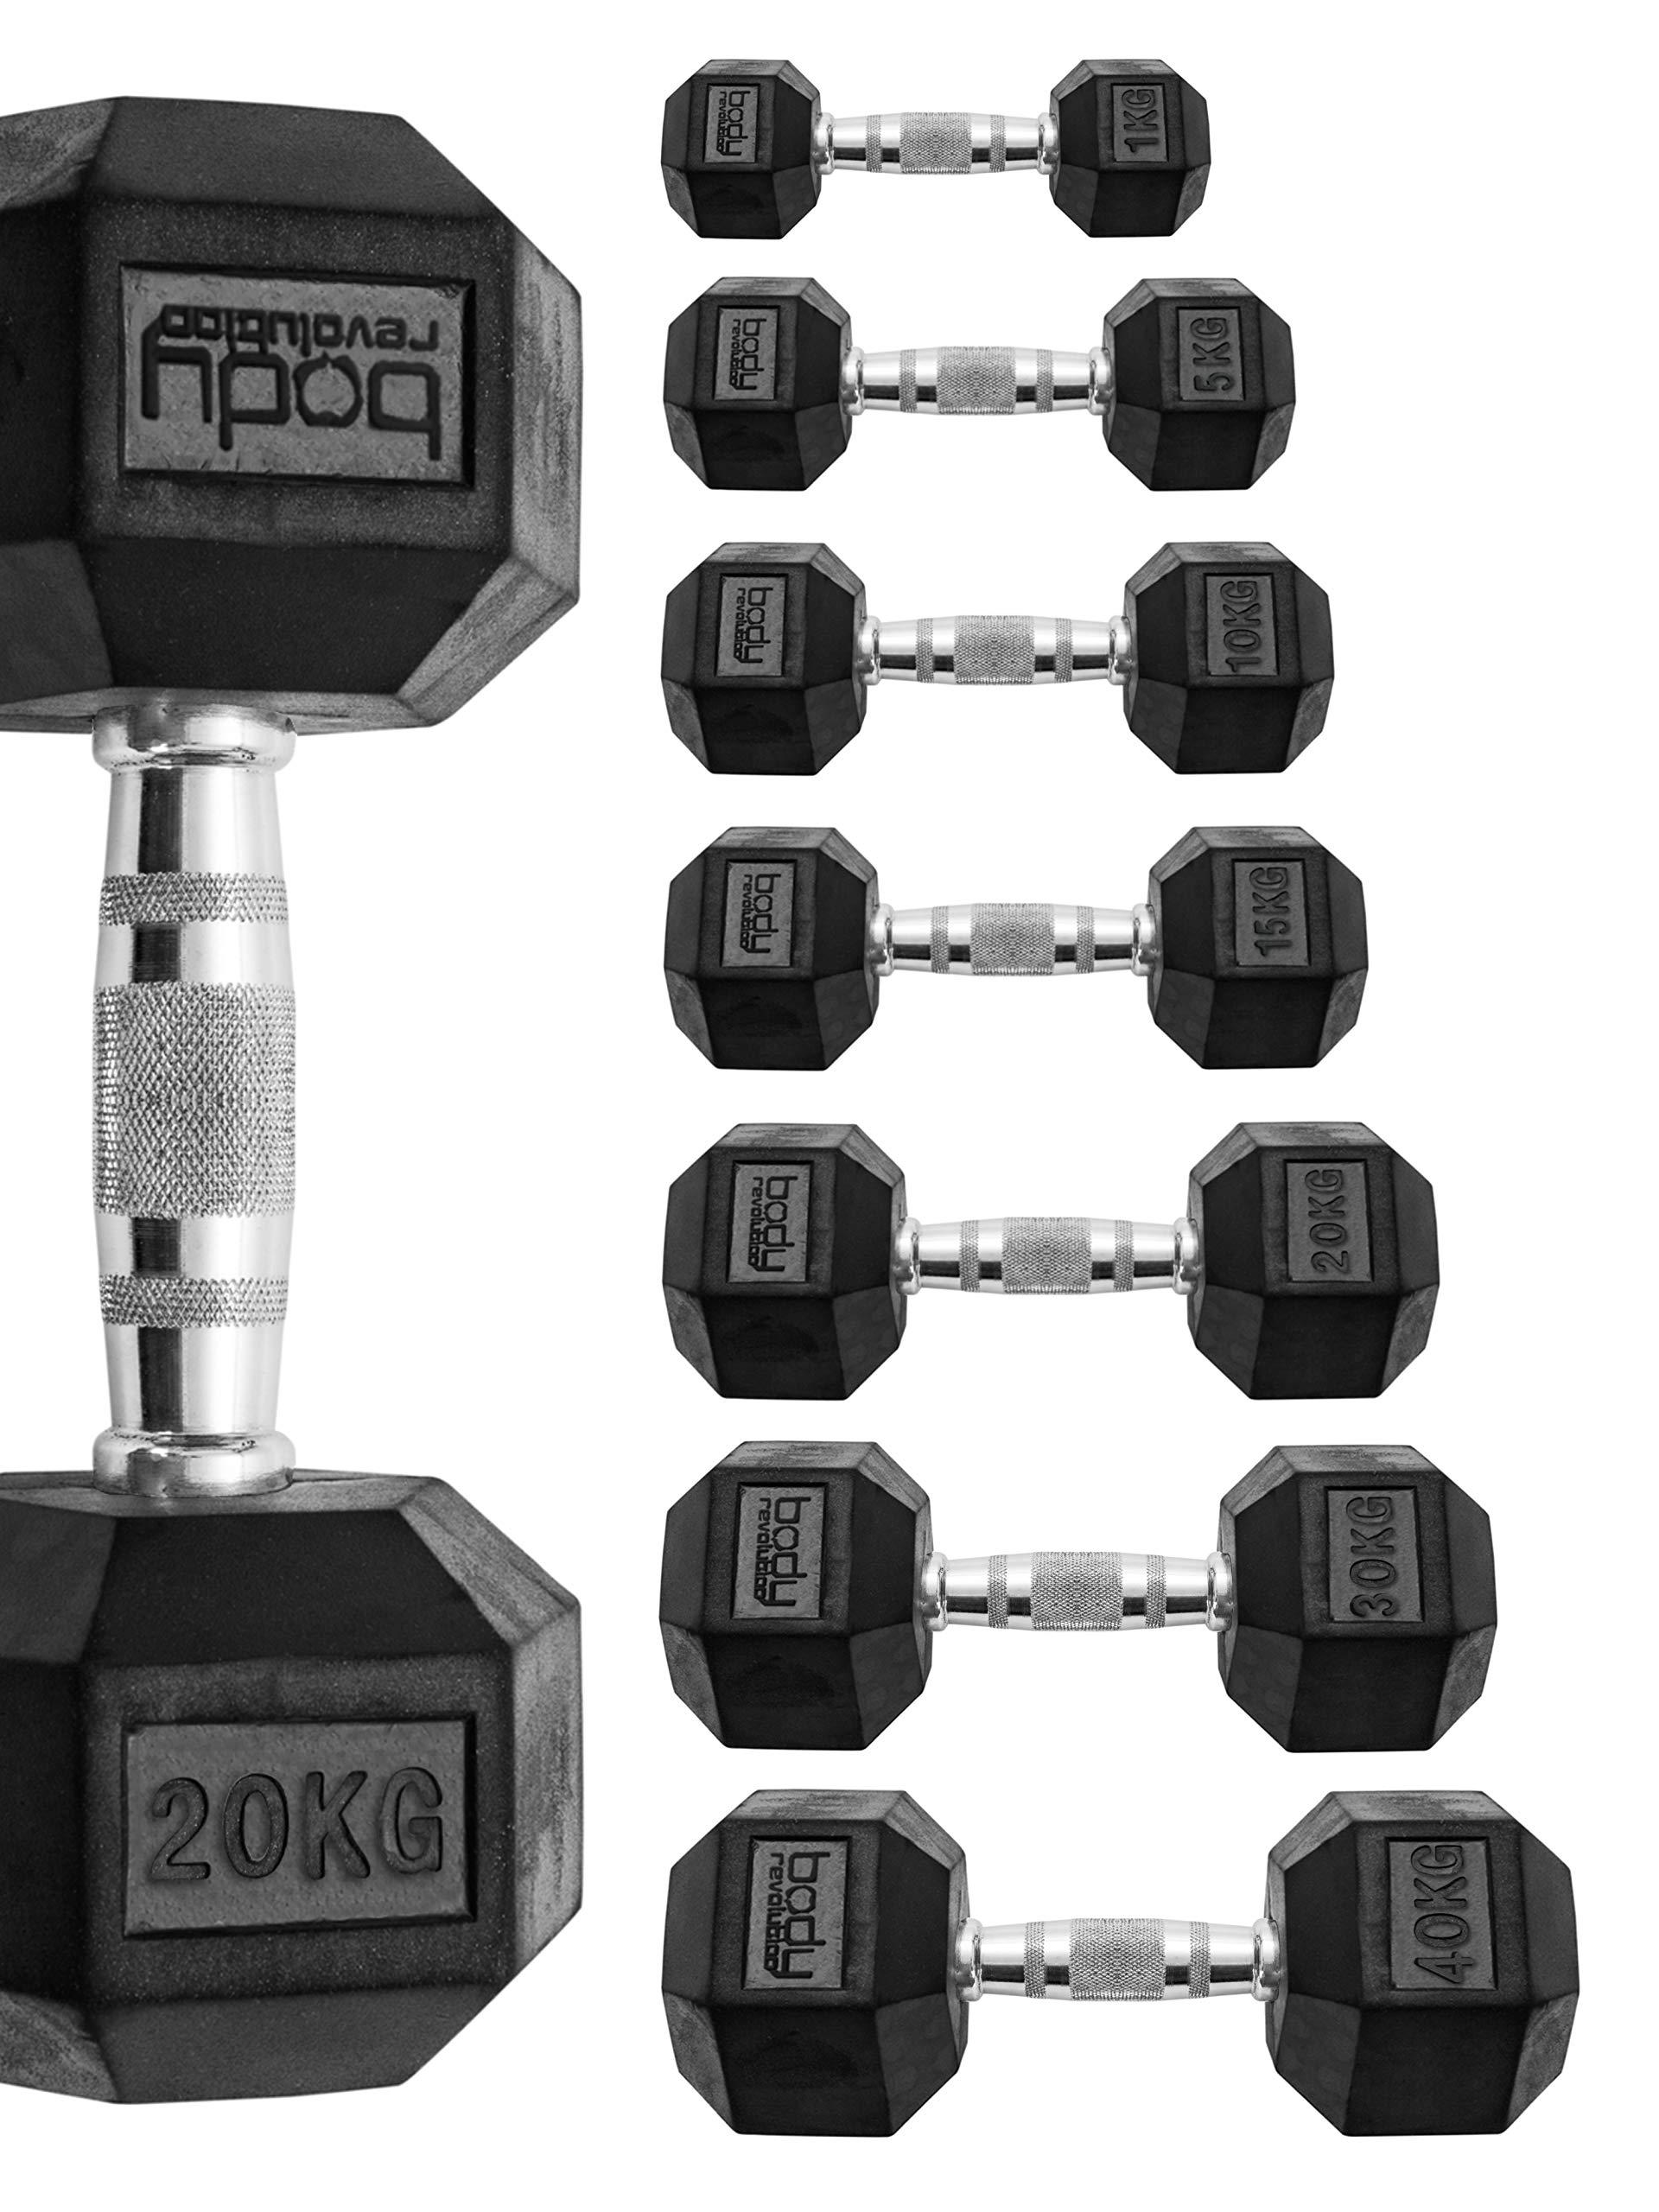 Hex Dumbbells 10kg//15kg//20kg Pairs Cast Iron Rubber Encased Home Gym Weight Set